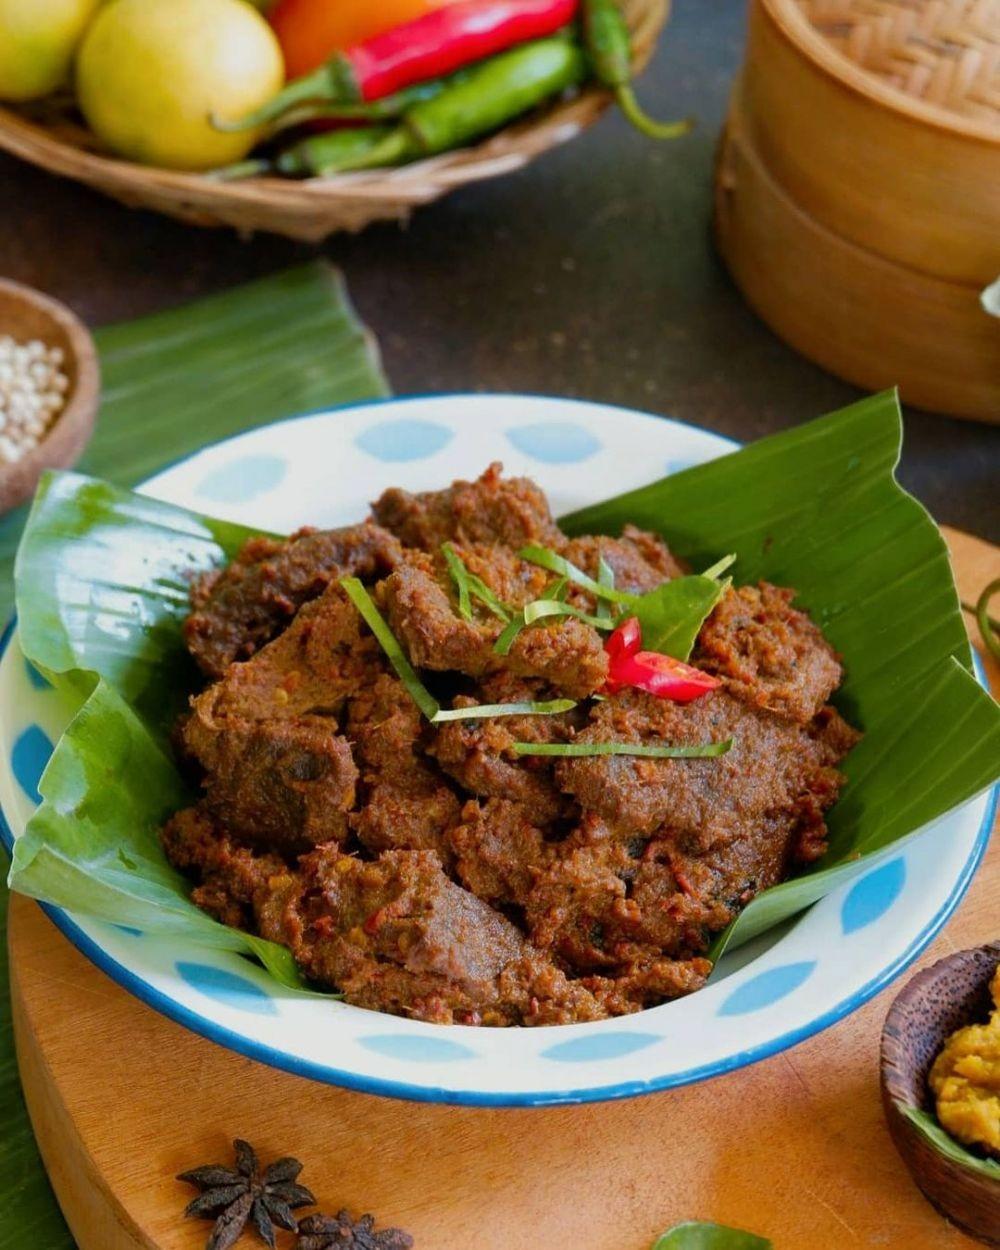 10 Harga Makanan Sederhana Khas Indonesia di Prancis, Mahal Abis!